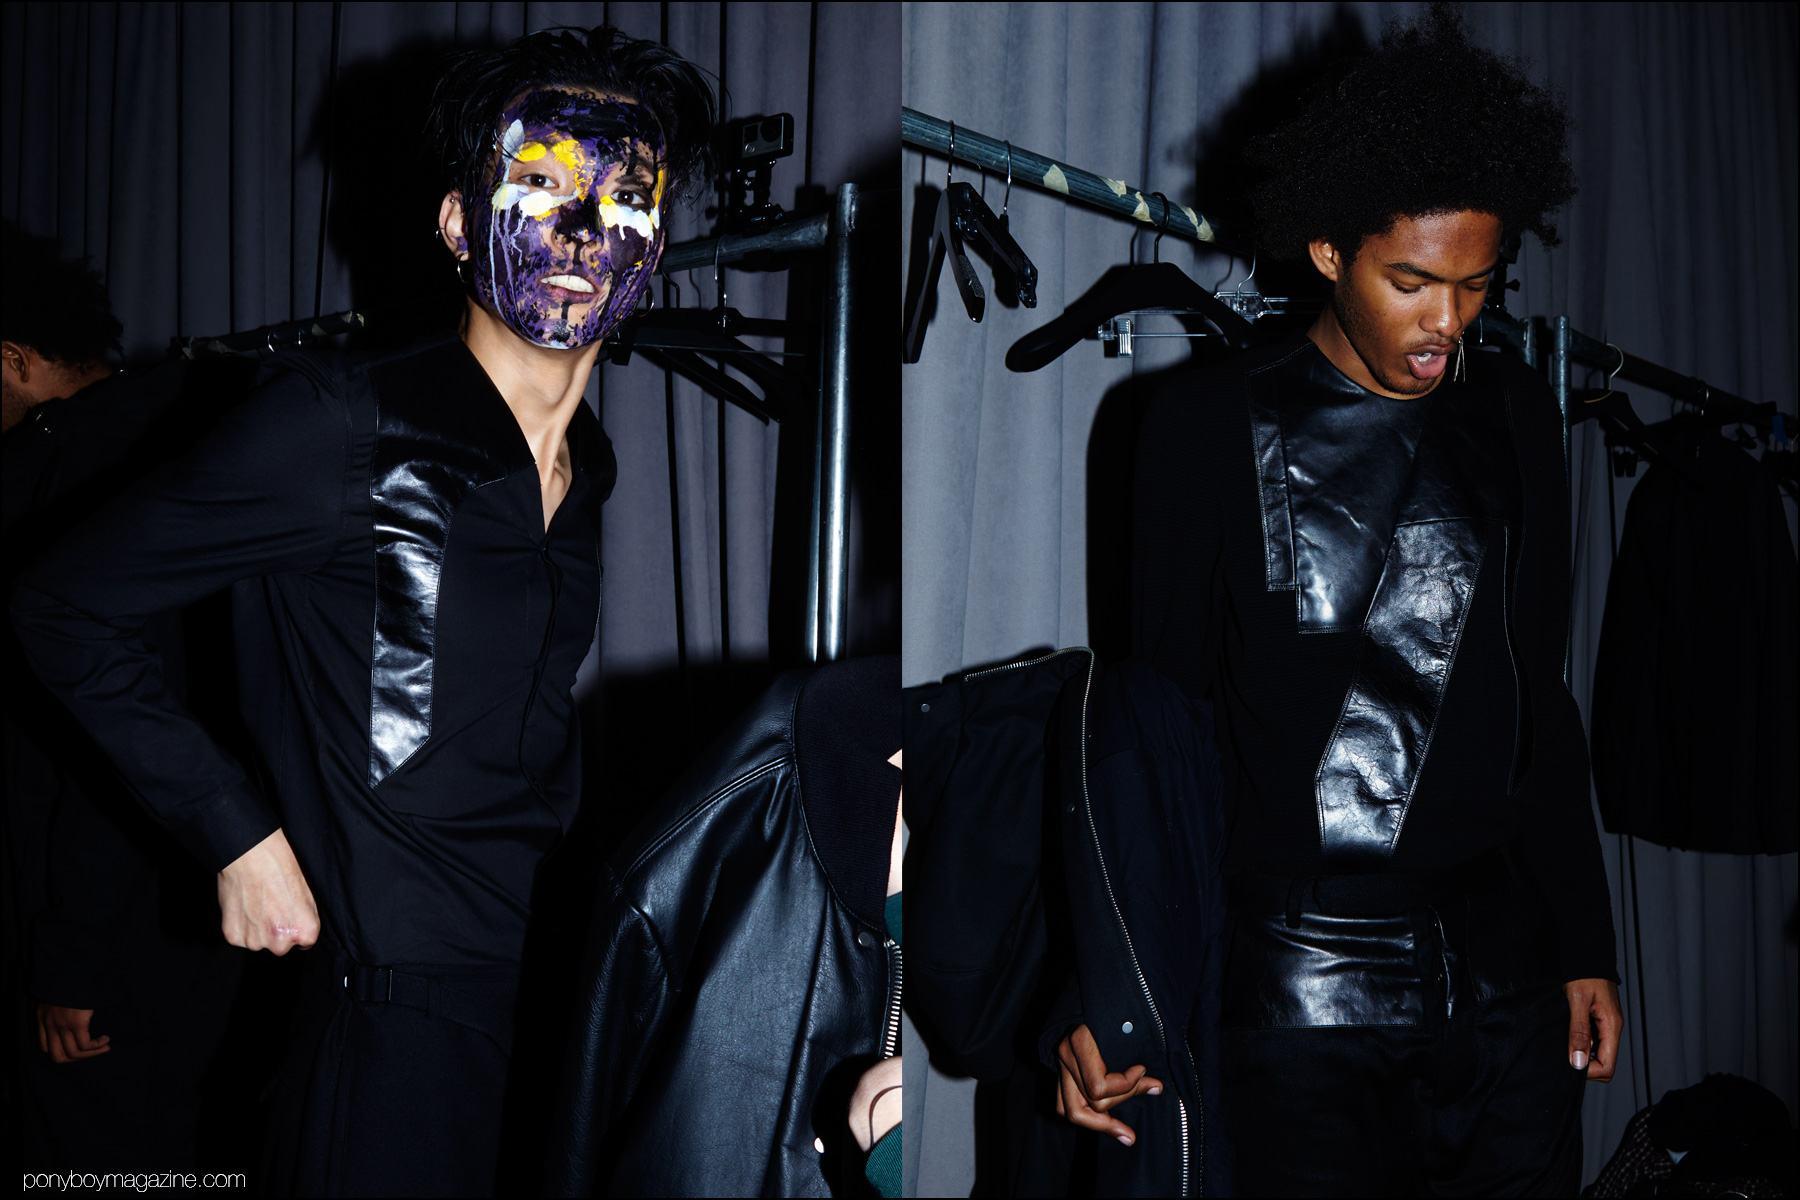 Model Brandon Bailey photographed backstage at Siki Im + Den Im F/W16 menswear show. Photography by Alexander Thompson for Ponyboy magazine NY.